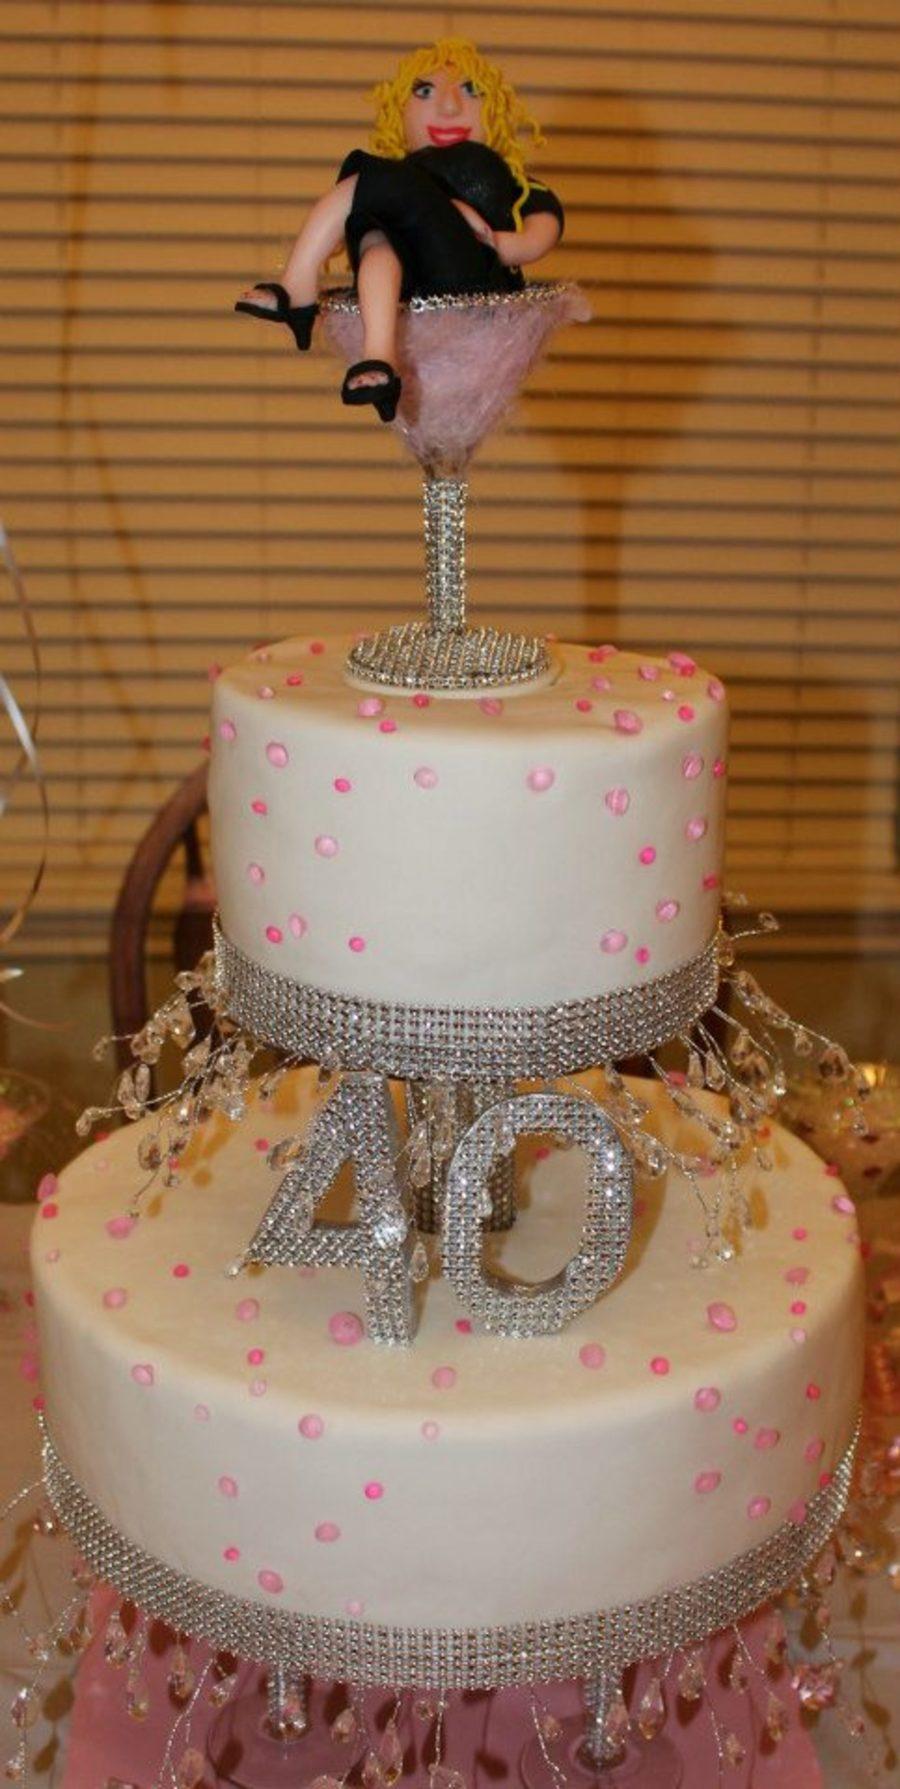 Fondant 40Th Birthday Cake For A Friend - CakeCentral.com